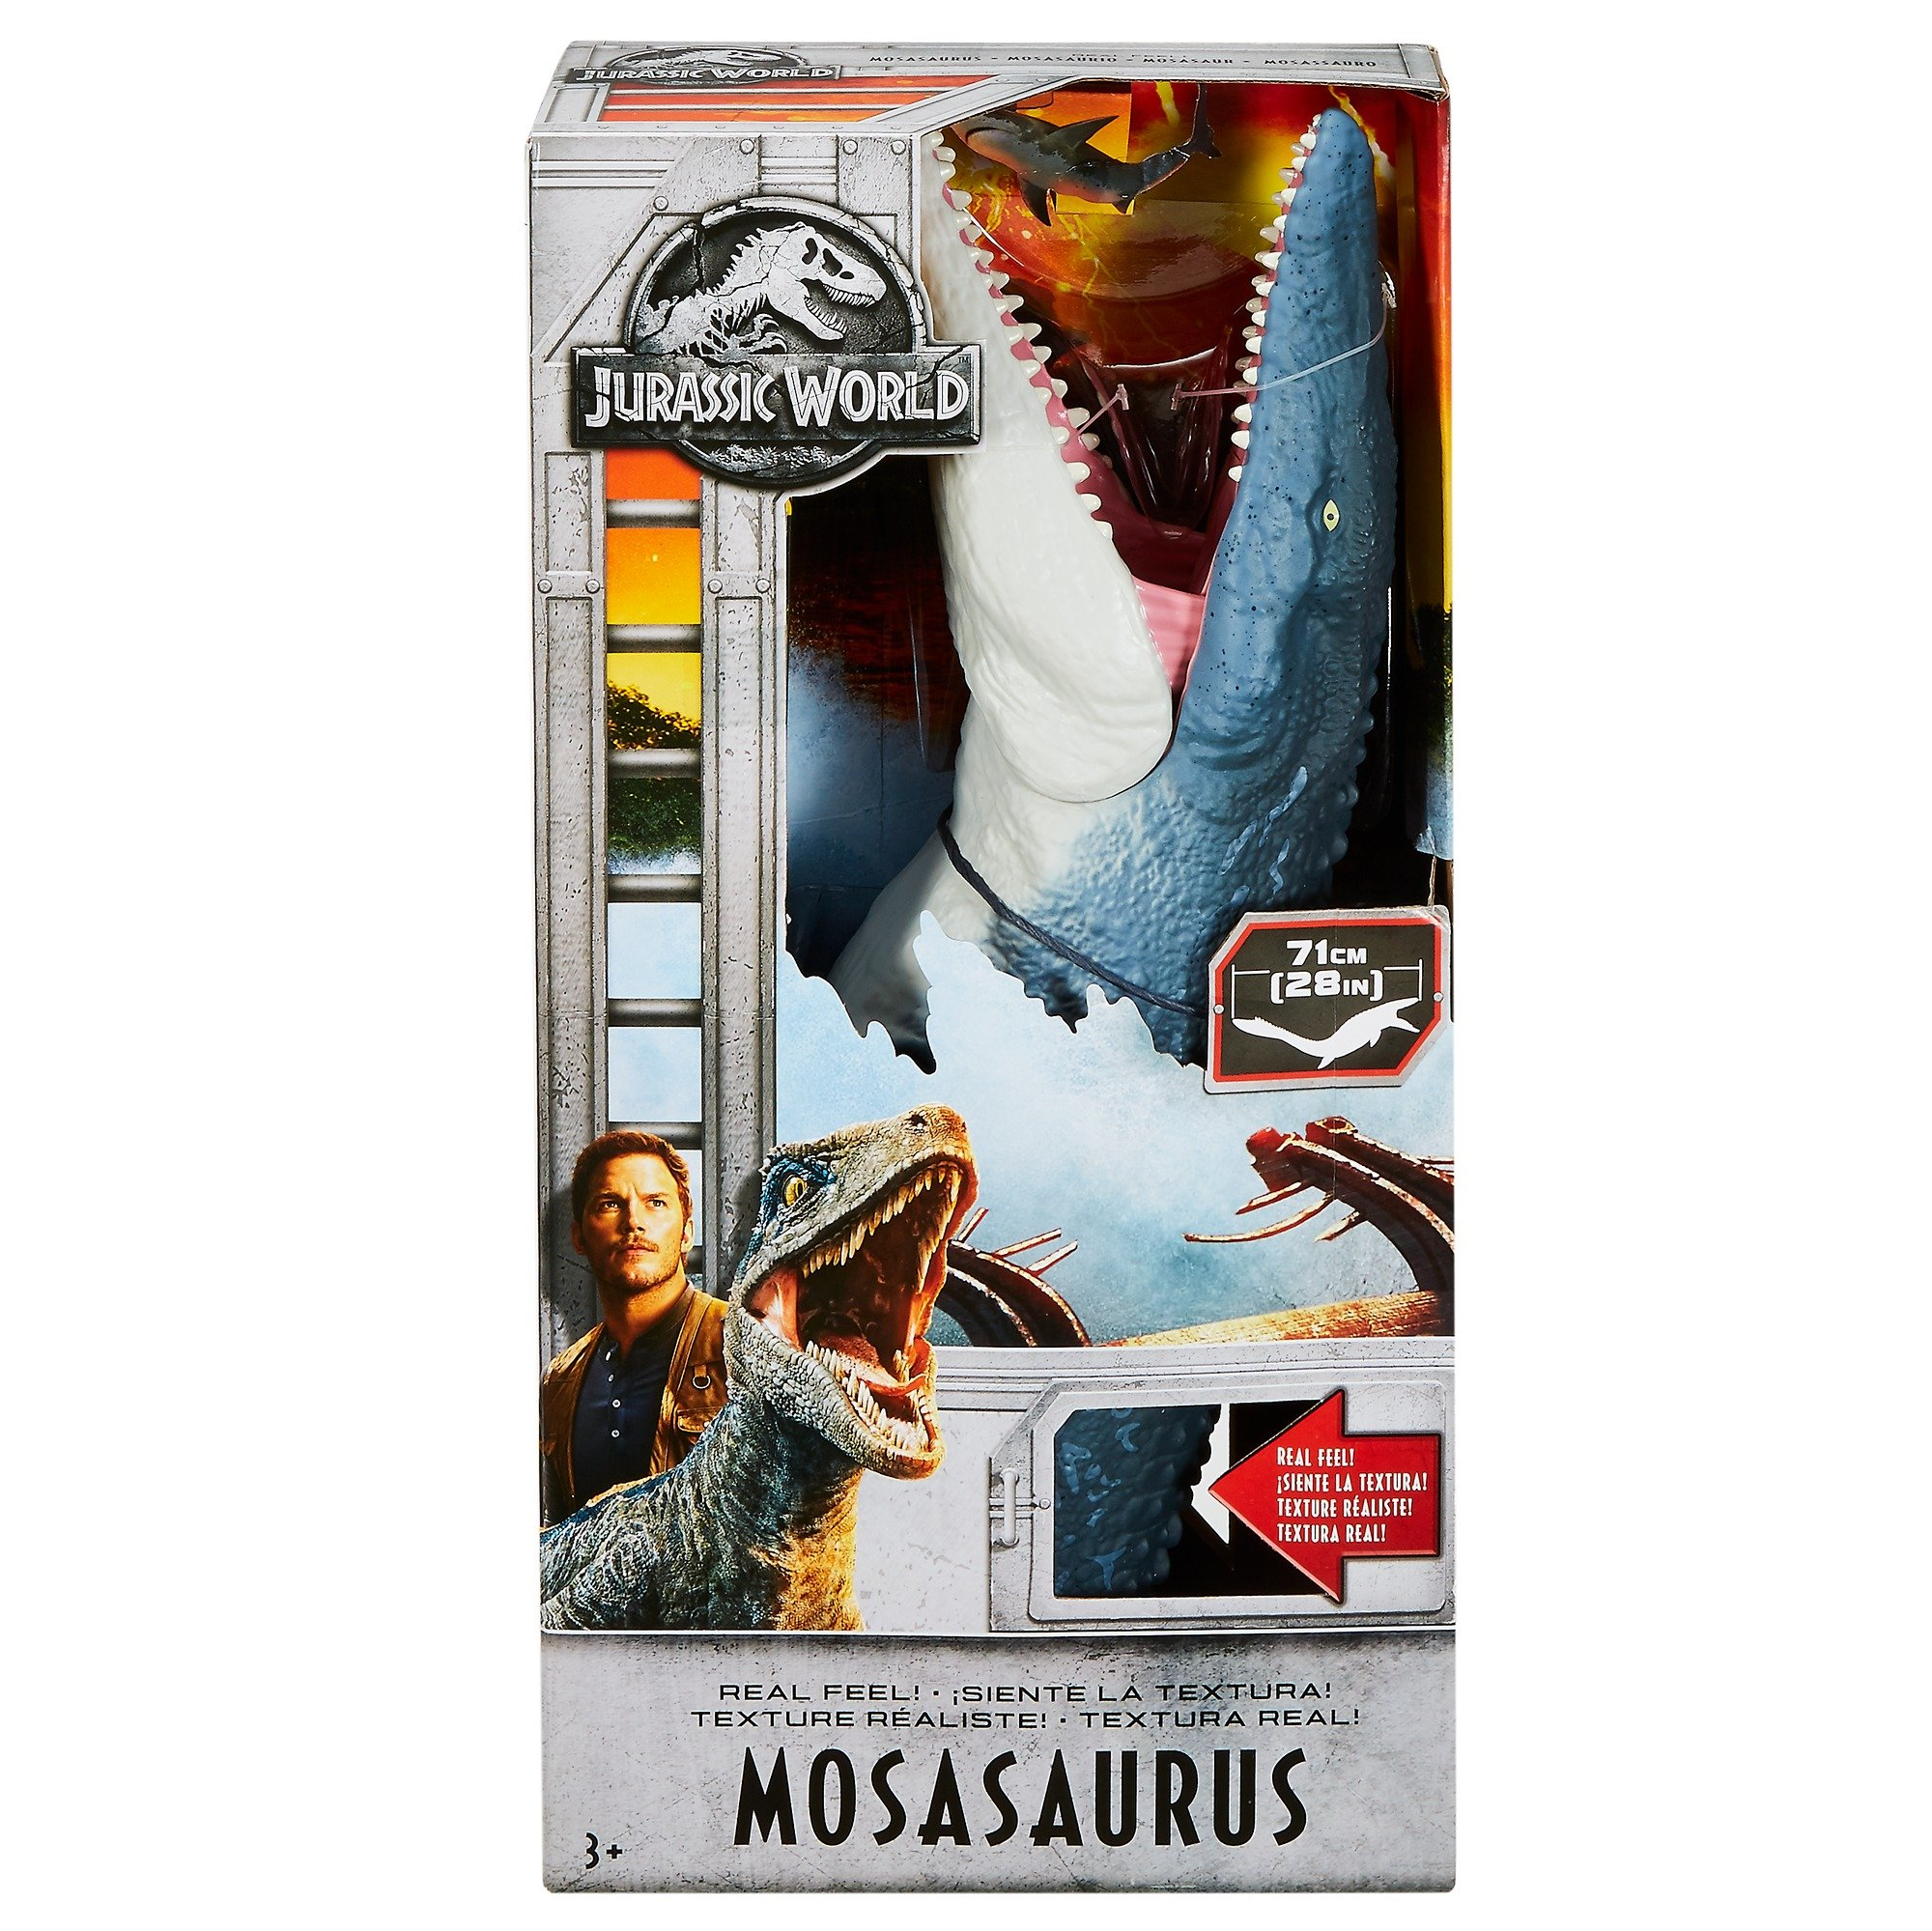 Jurassic World Real Feel Mosasaurus Figure by Jurassic World Toys (Image #5)